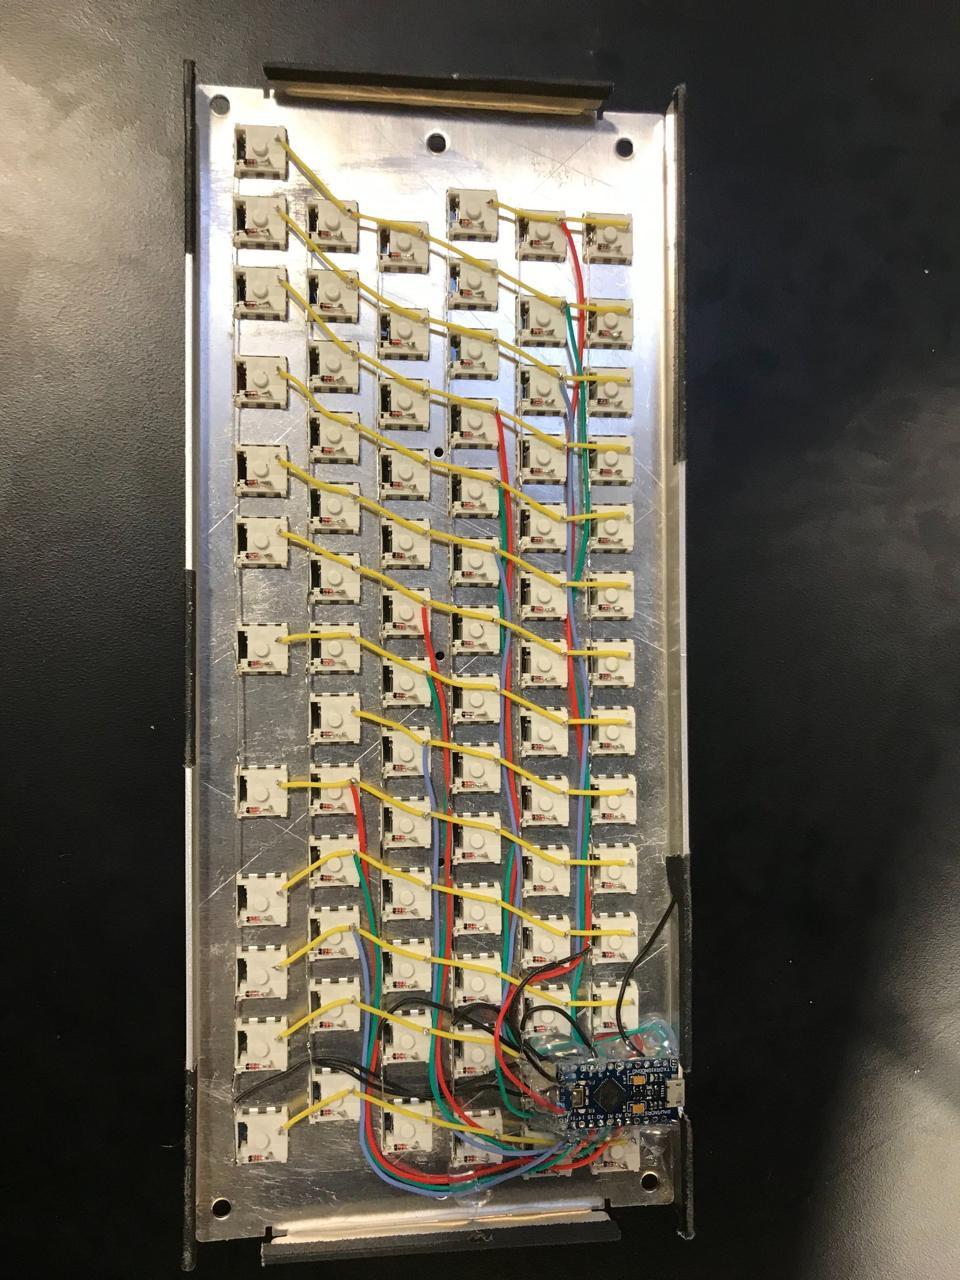 Early System76 keyboard prototype